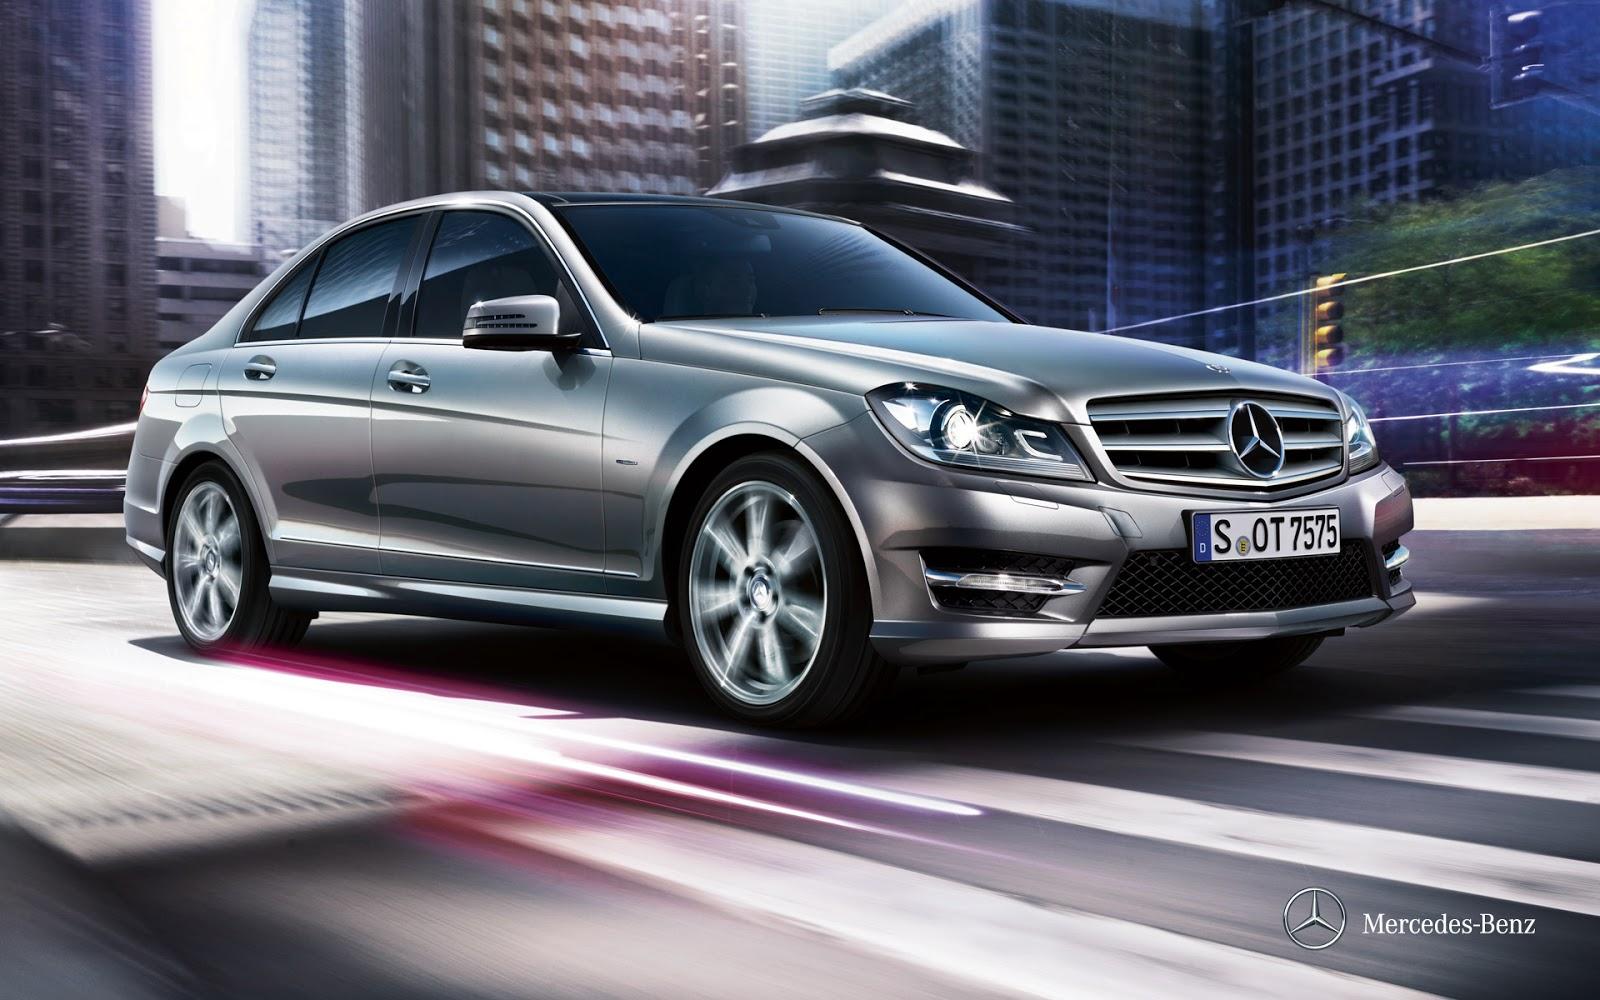 Mercedes C200 صور ومواصفات وأسعار مرسيدس C200 موديل 2013 ...